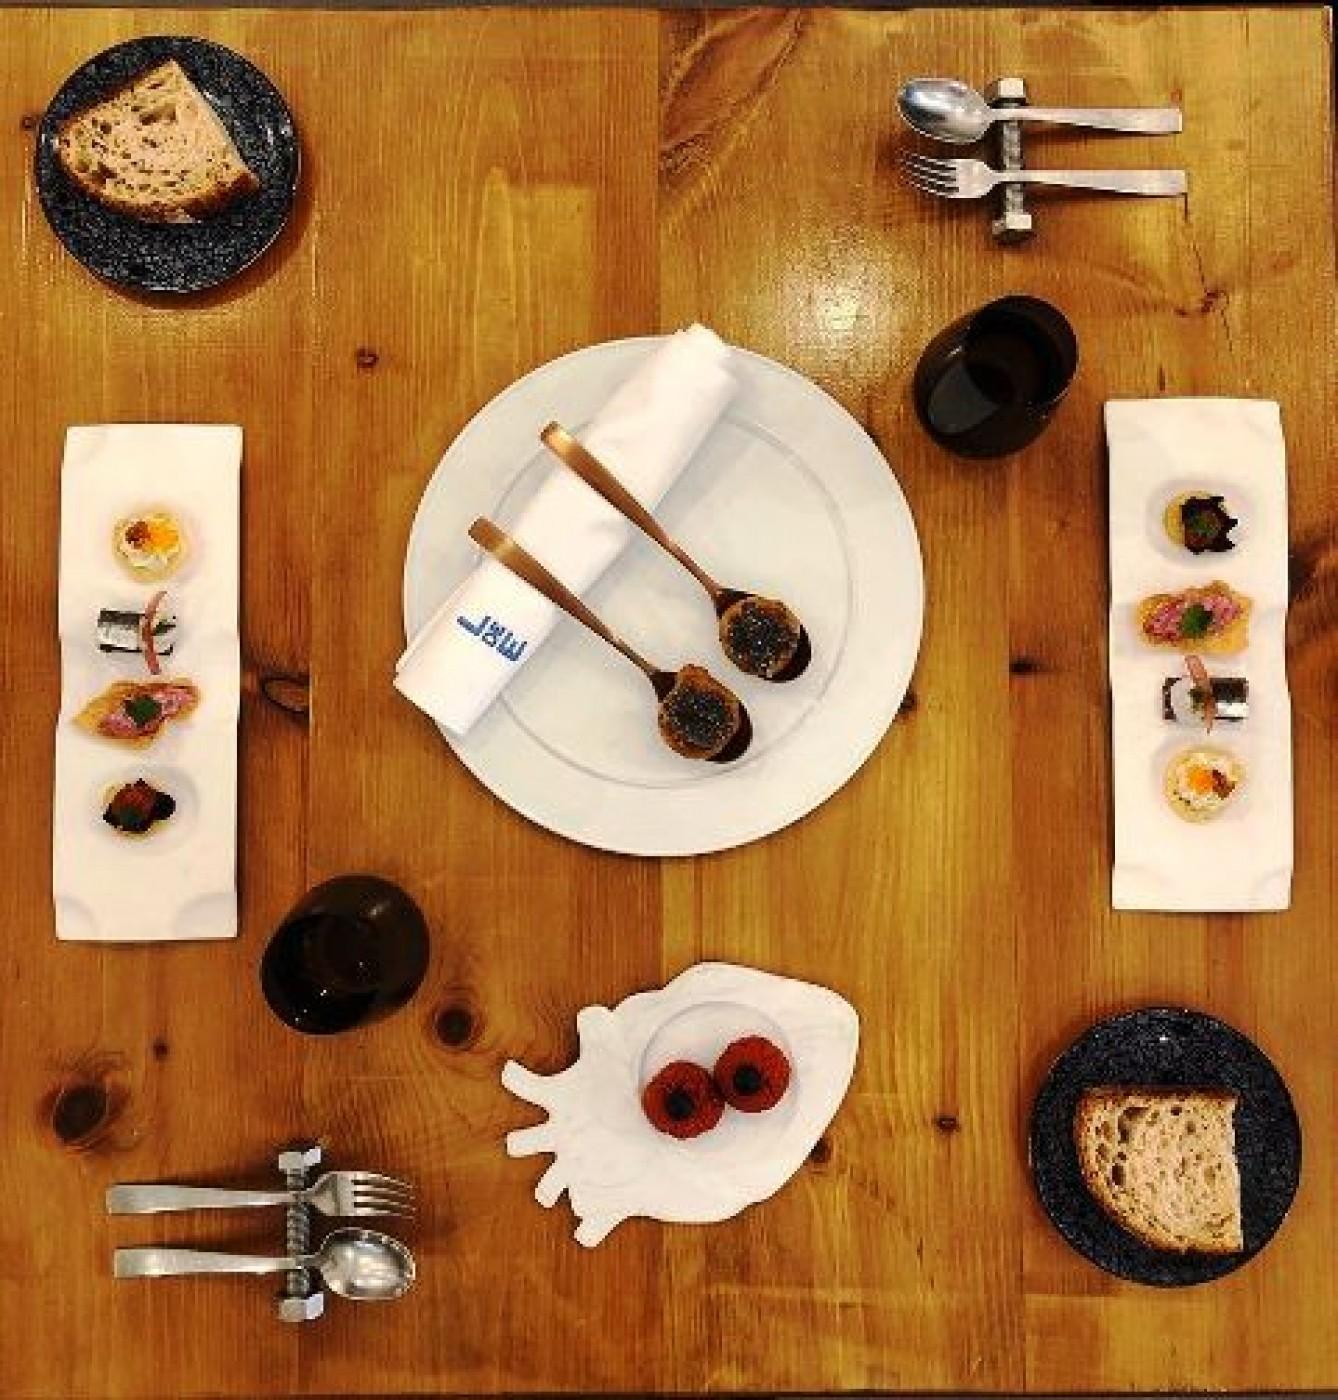 Local de Ensayo Restaurant